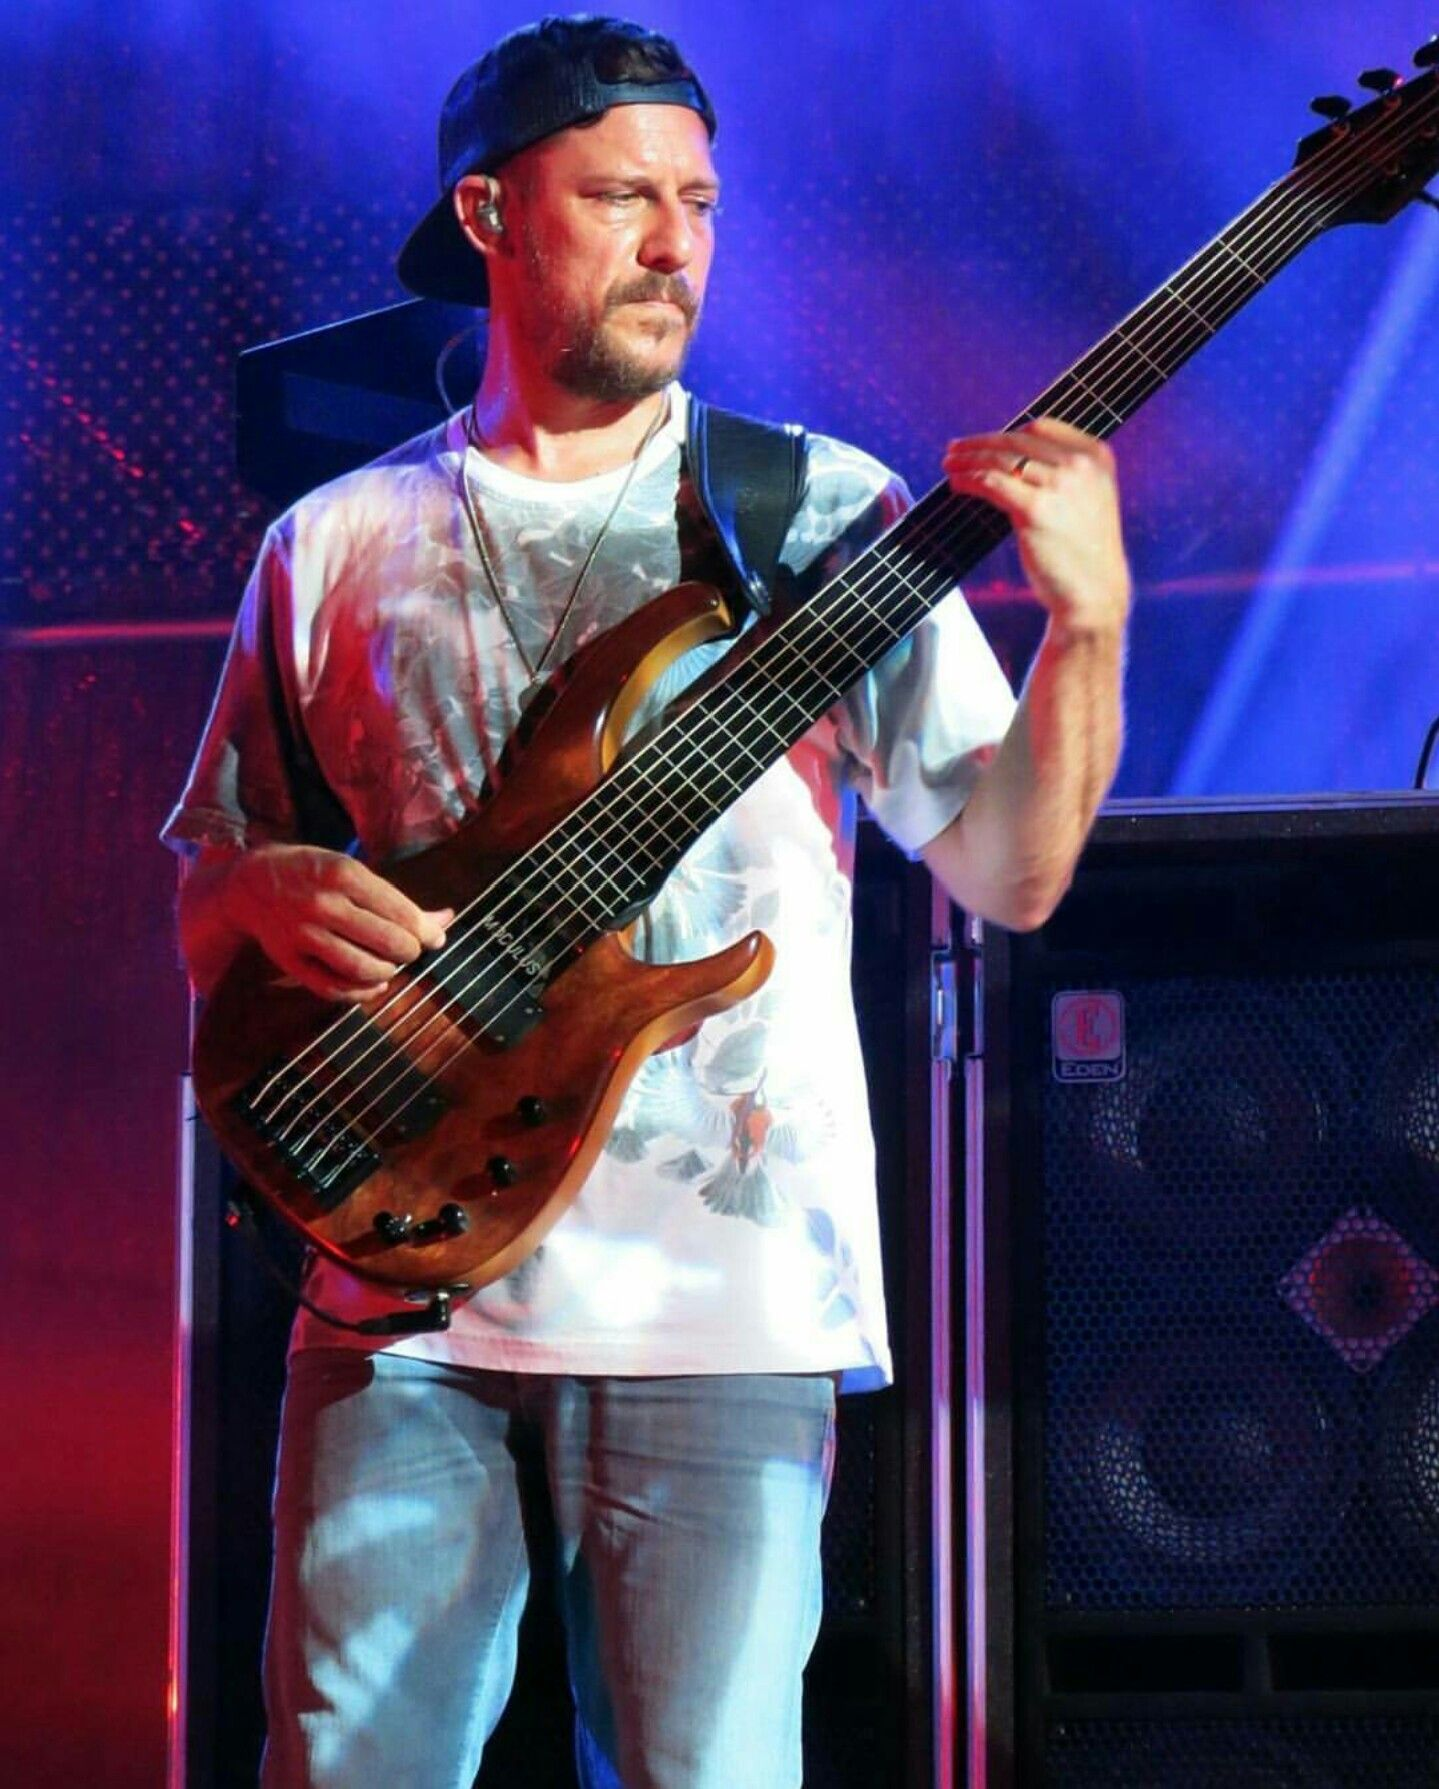 MUST Love DAVE! | Dave matthews, Music instruments, Dave